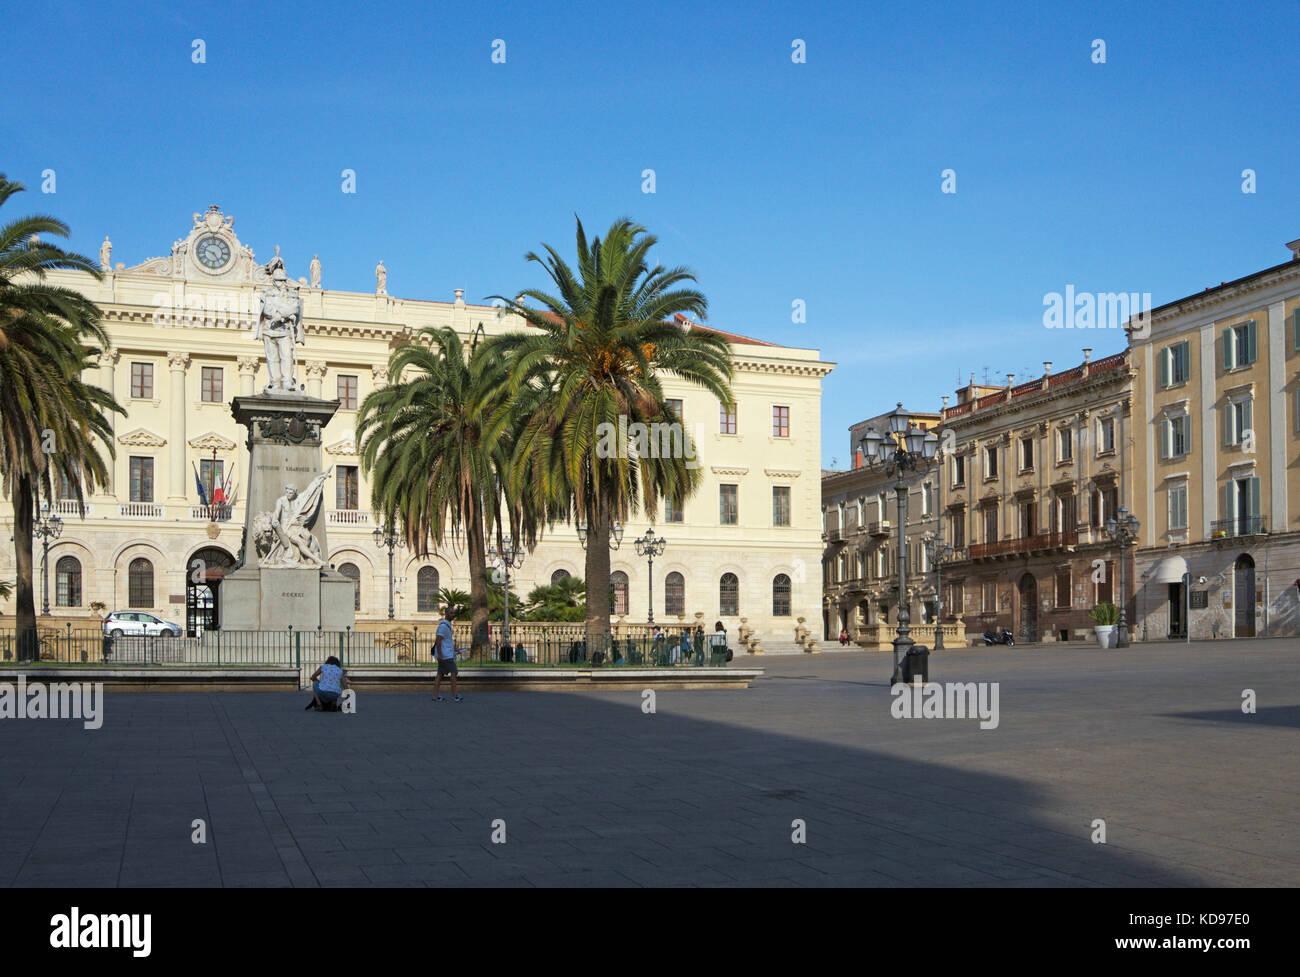 El Palazzo della provincia en Plaza Italia, Sassari, Cerdeña, Italia Imagen De Stock